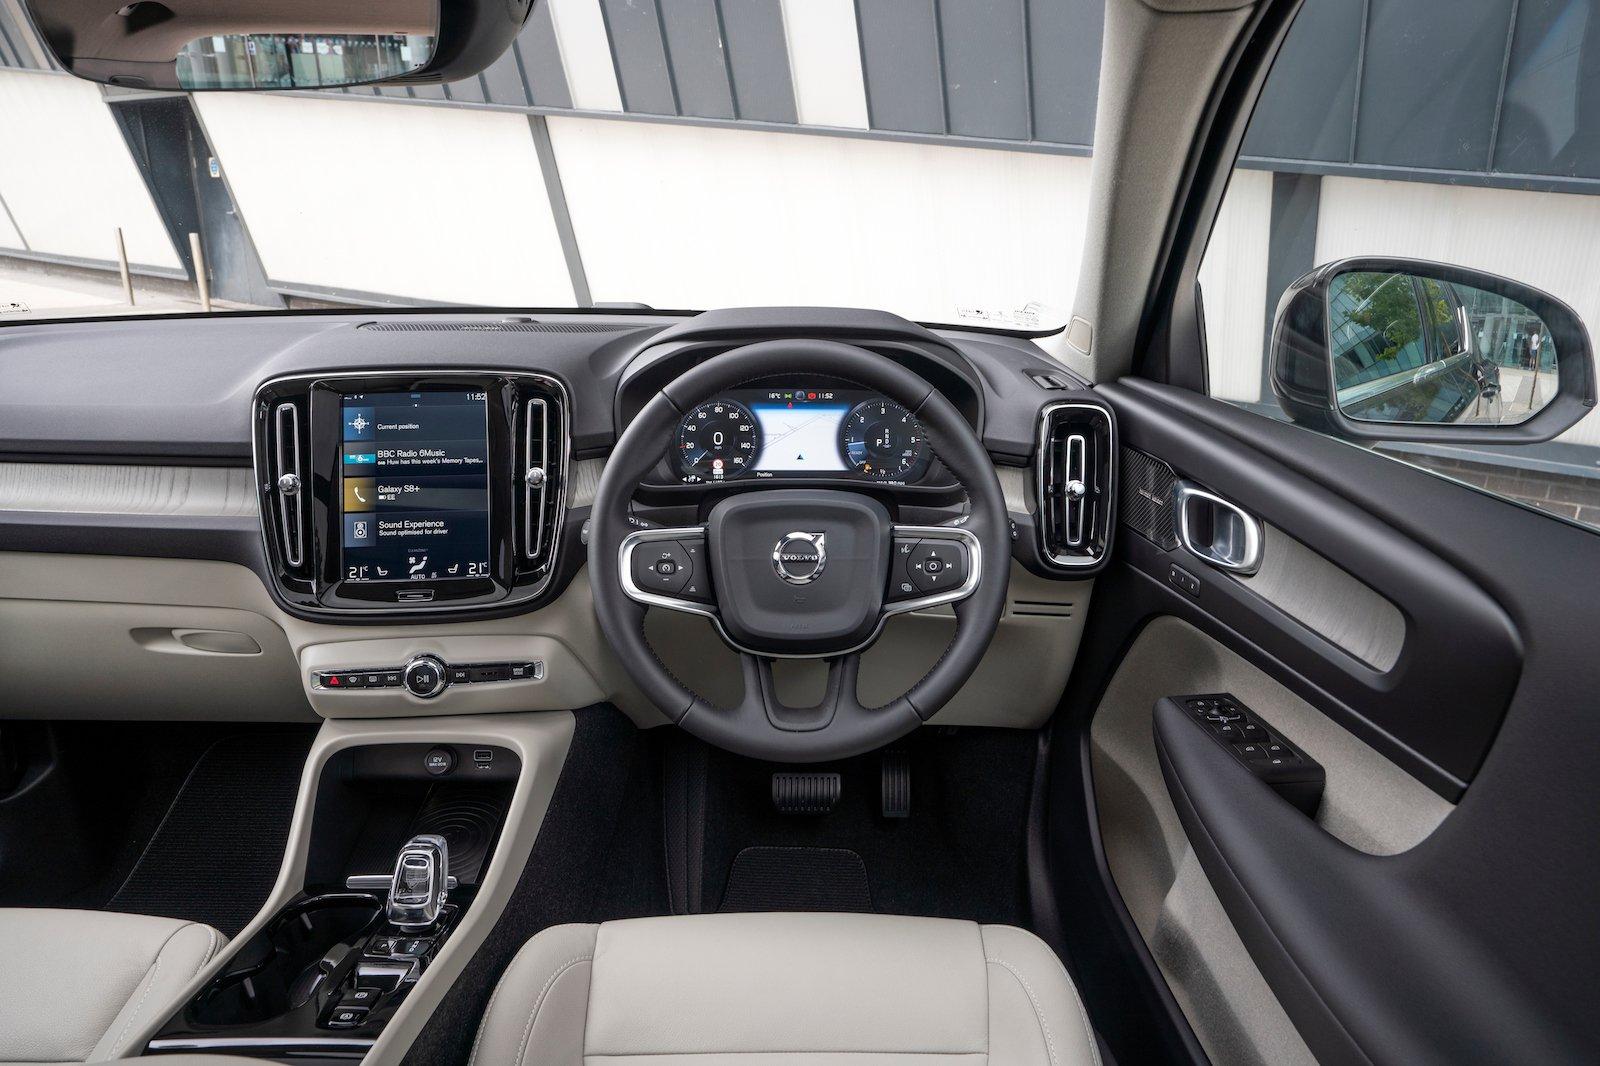 2018 Volvo XC40 dash